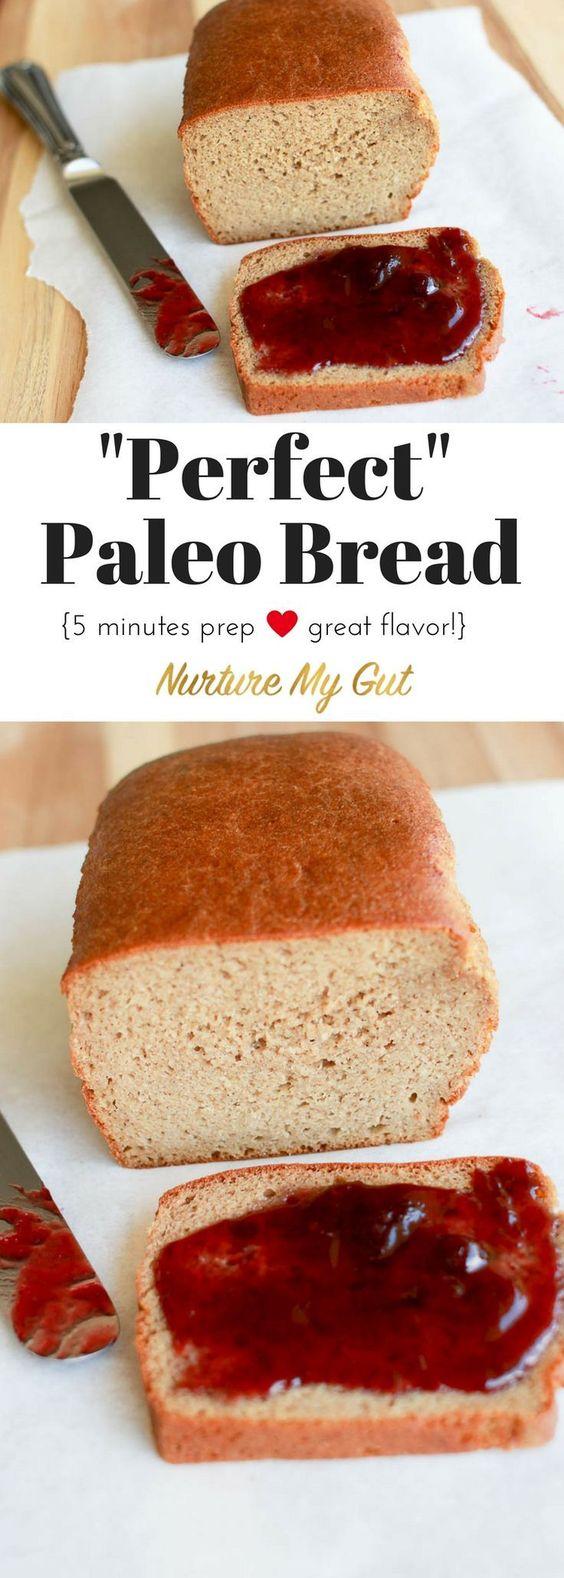 Perfect Paleo Bread (SAVORY)